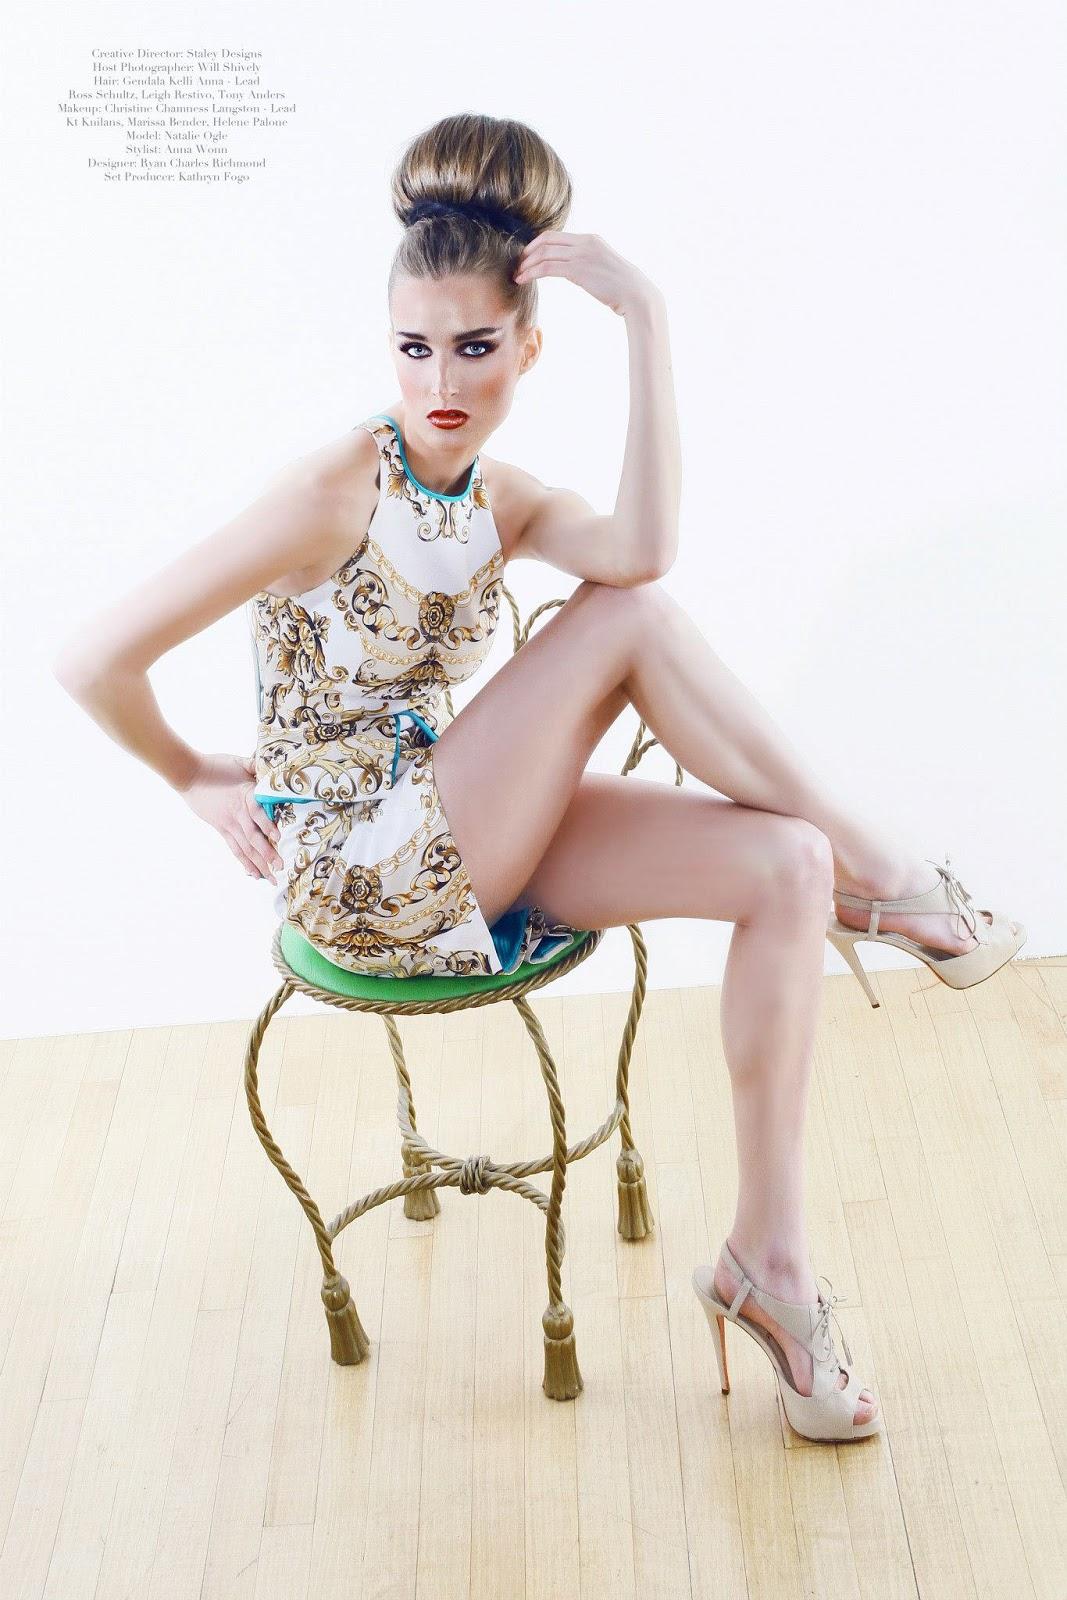 Natalie Ogle Nude Photos 4